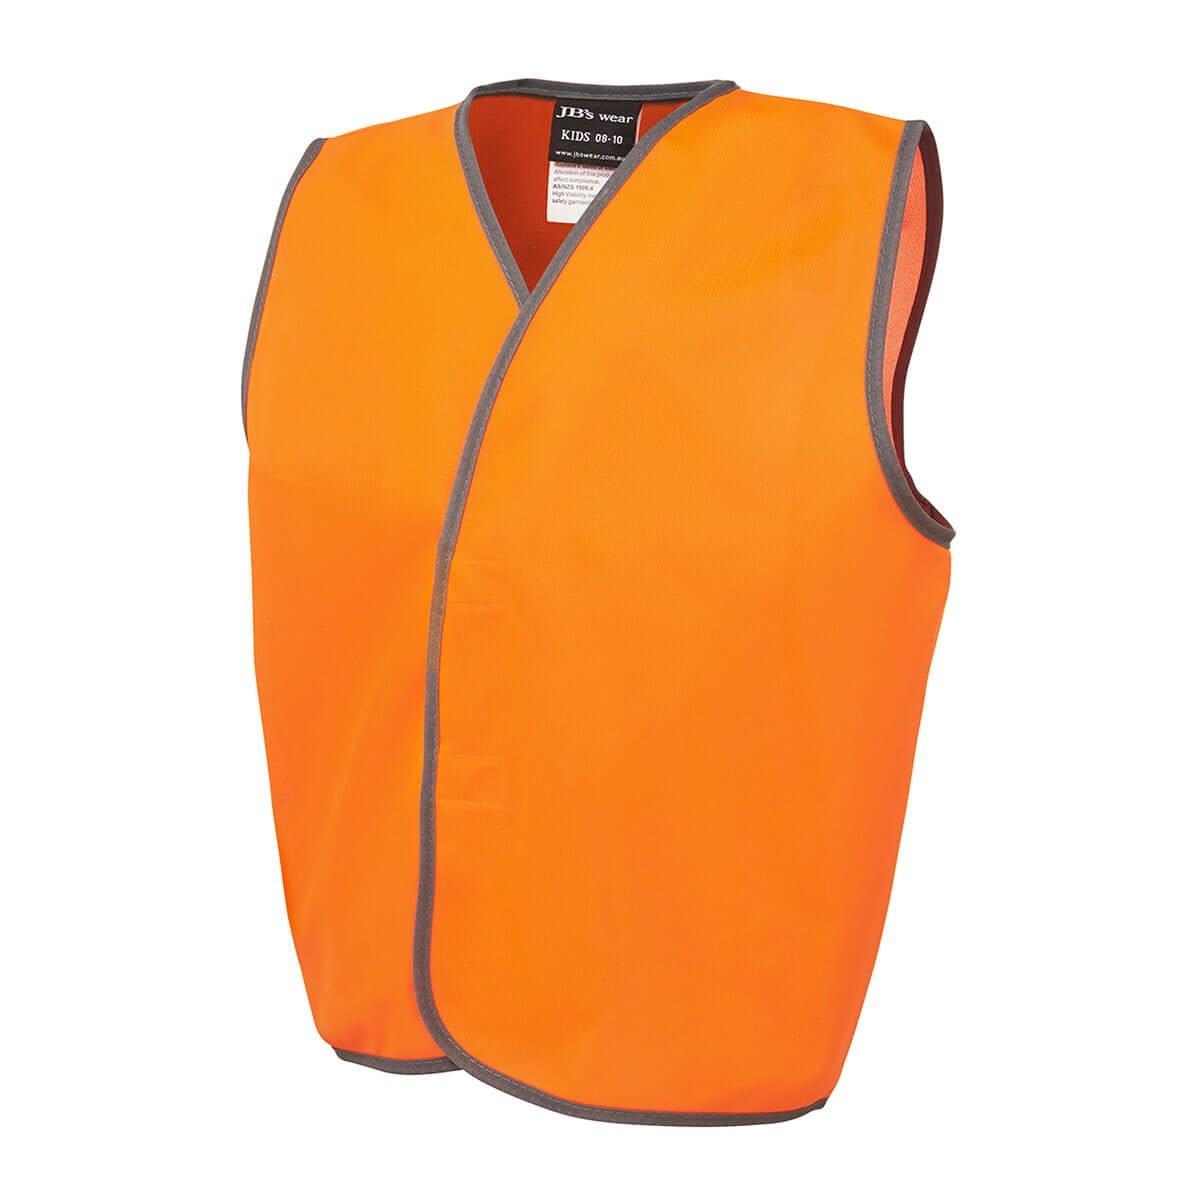 HV KIDS SAFETY VEST-Orange